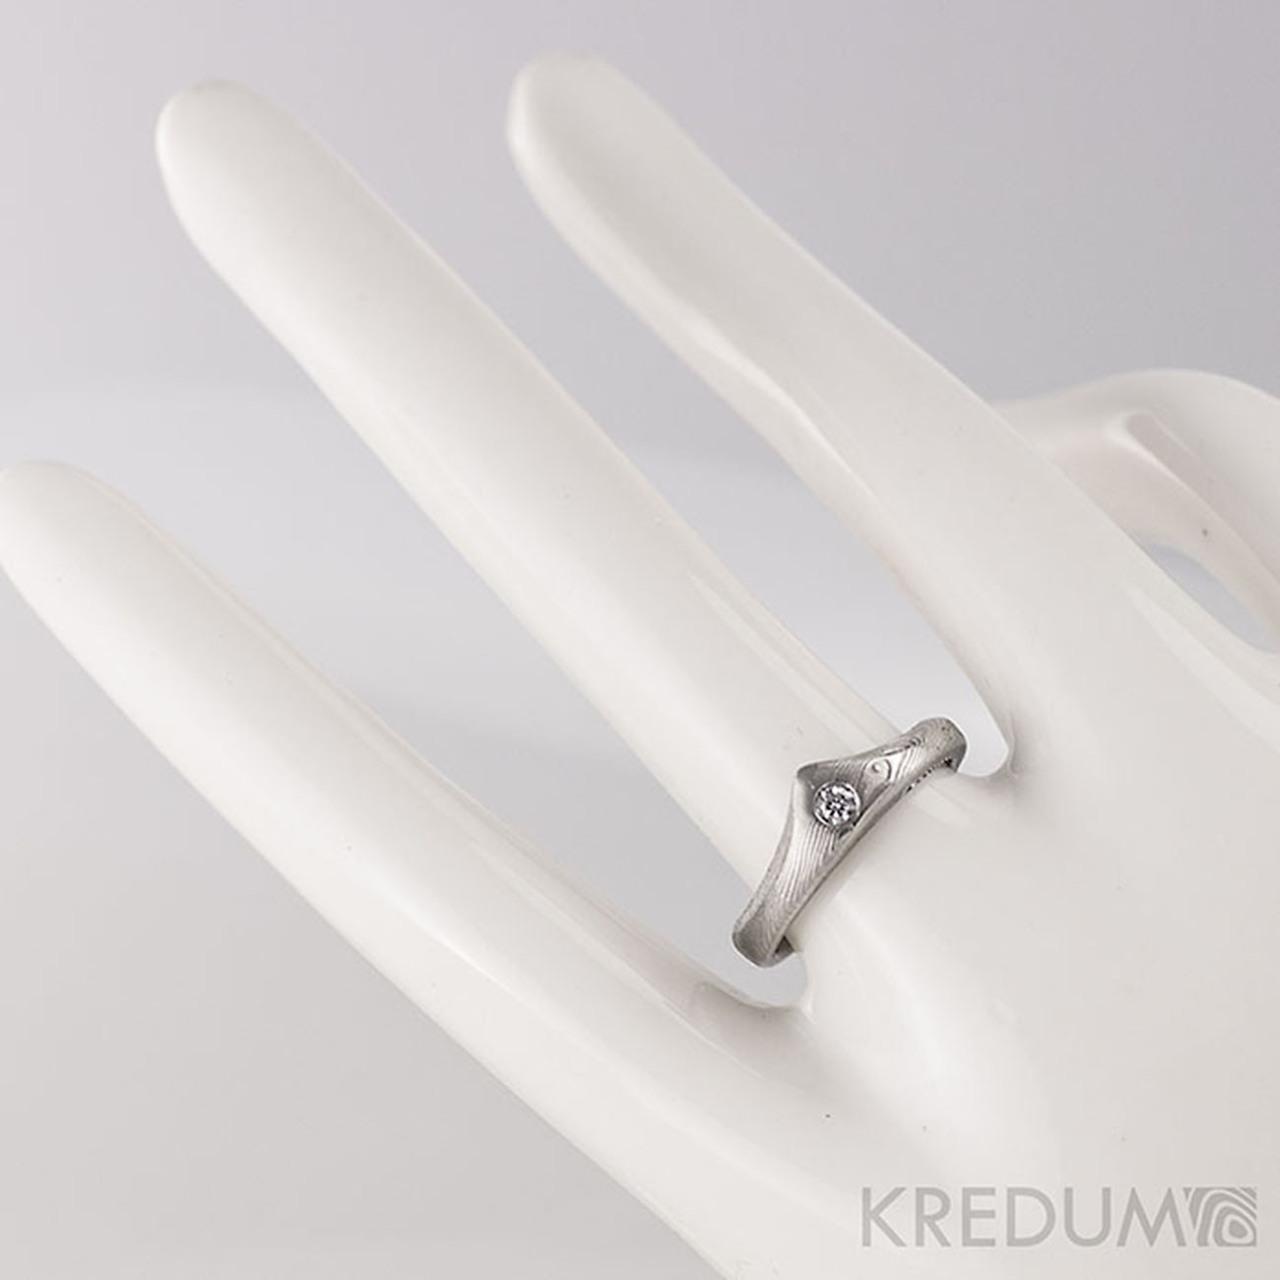 Kralovna A Ciry Diamant 2 3 Mm Zasnubni Prsten Damasteel Struktura